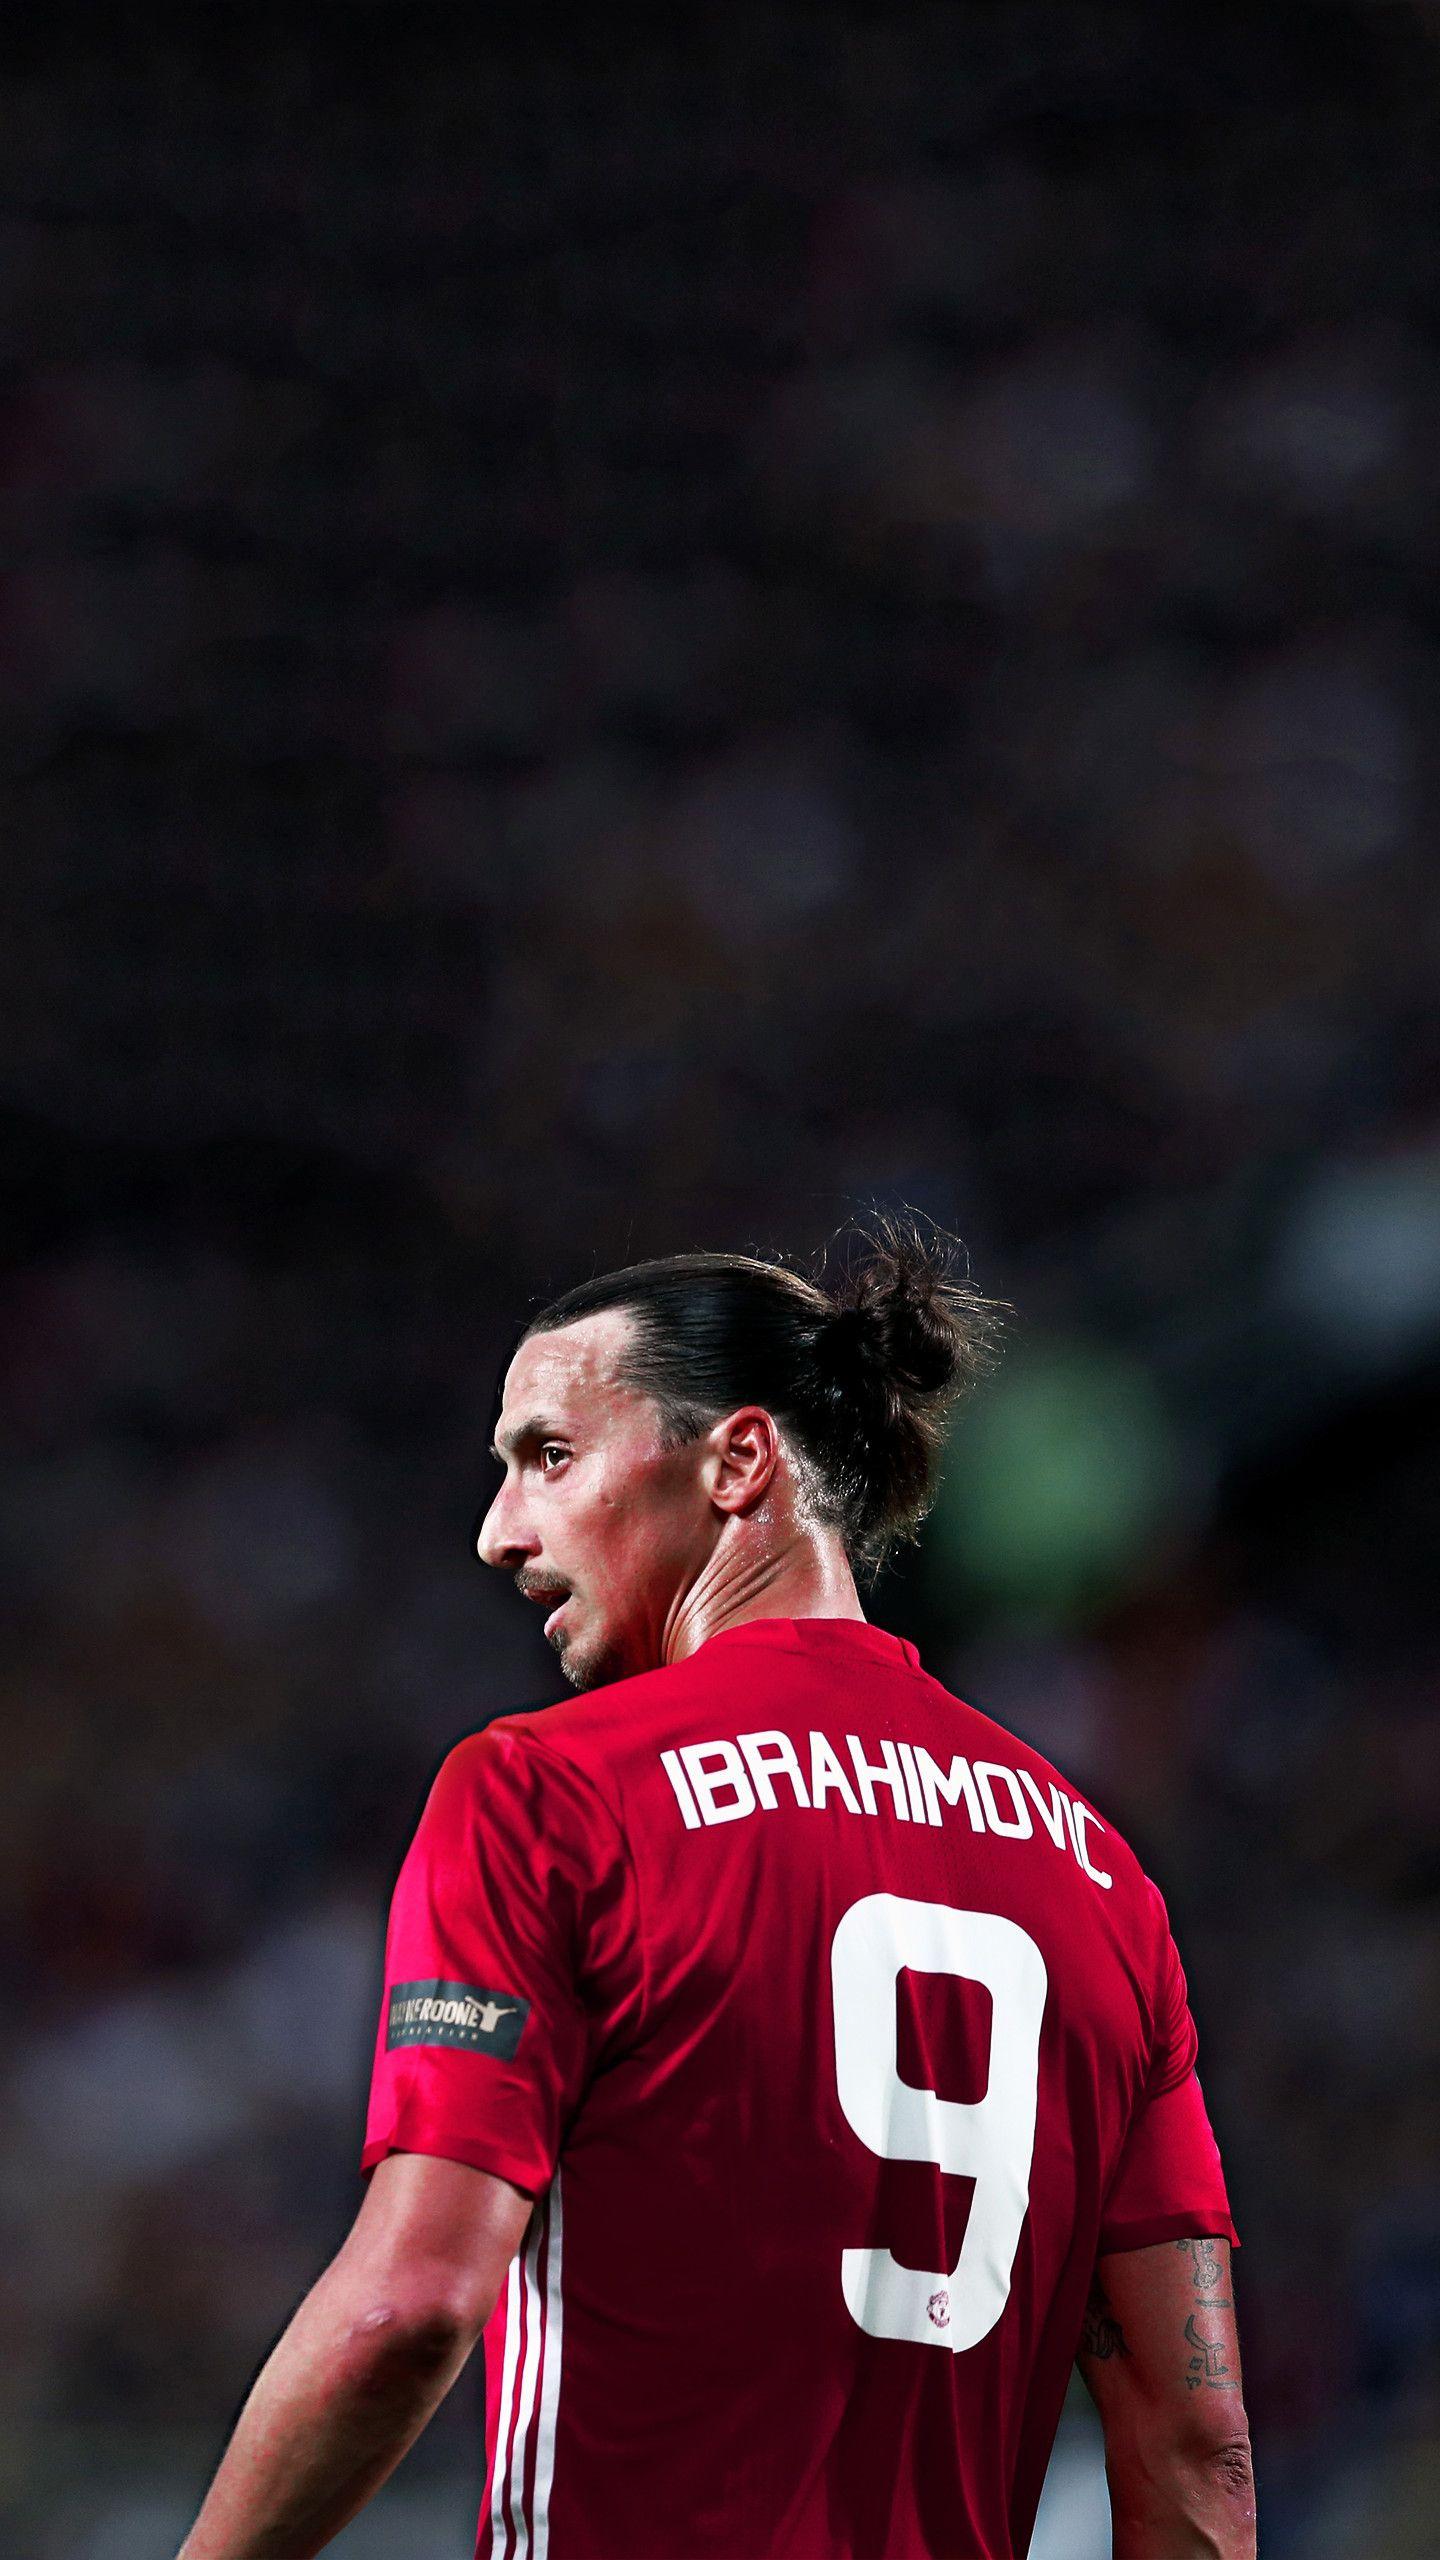 55 Zlatan Ibrahimovic Wallpapers   Download at WallpaperBro 1440x2560